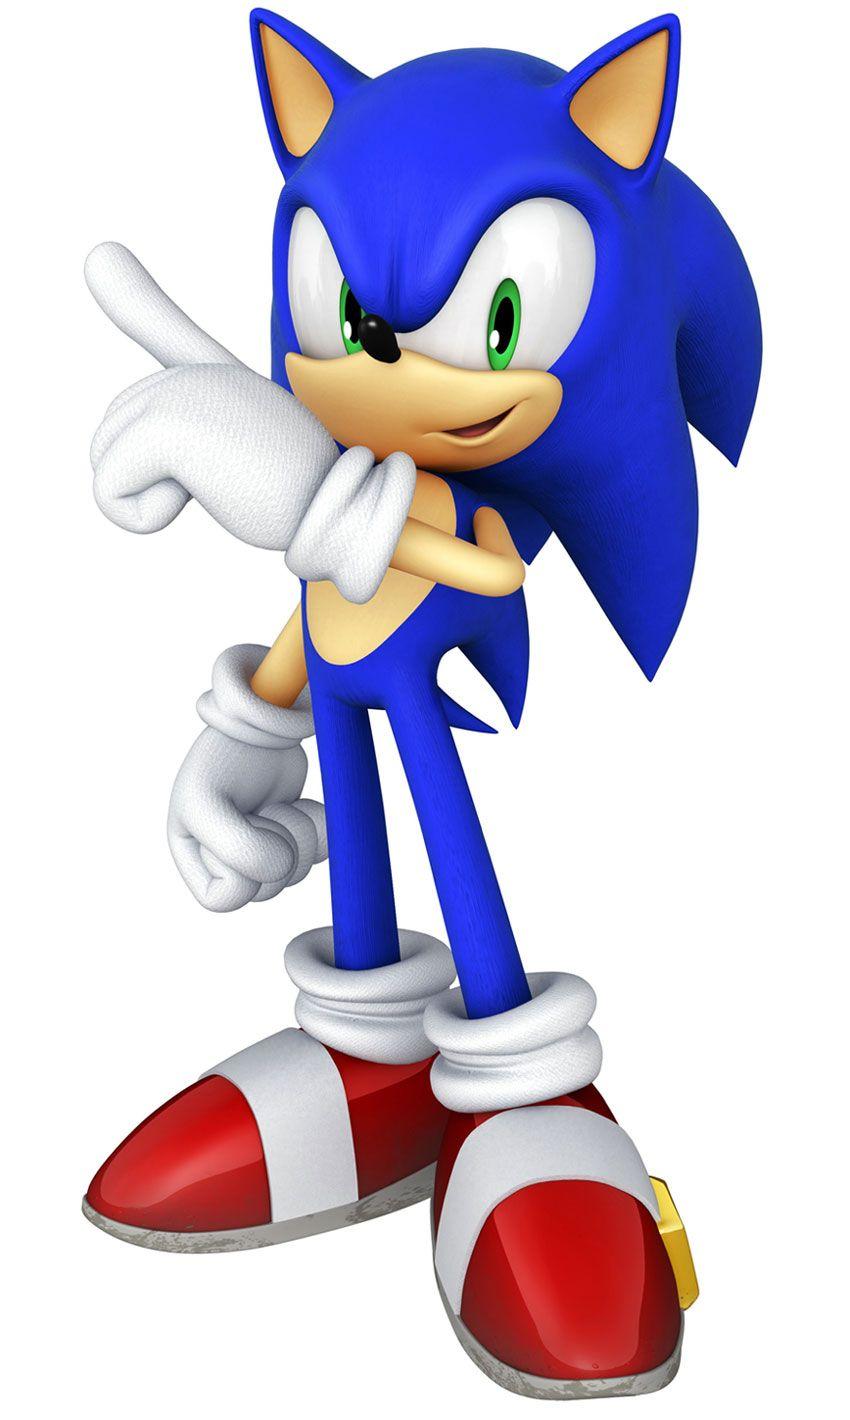 Sonic The Hedgehog Art Galeria De Arte Transformado De Sonic All Stars Racing In 2021 Sonic The Hedgehog Sonic Hedgehog Art